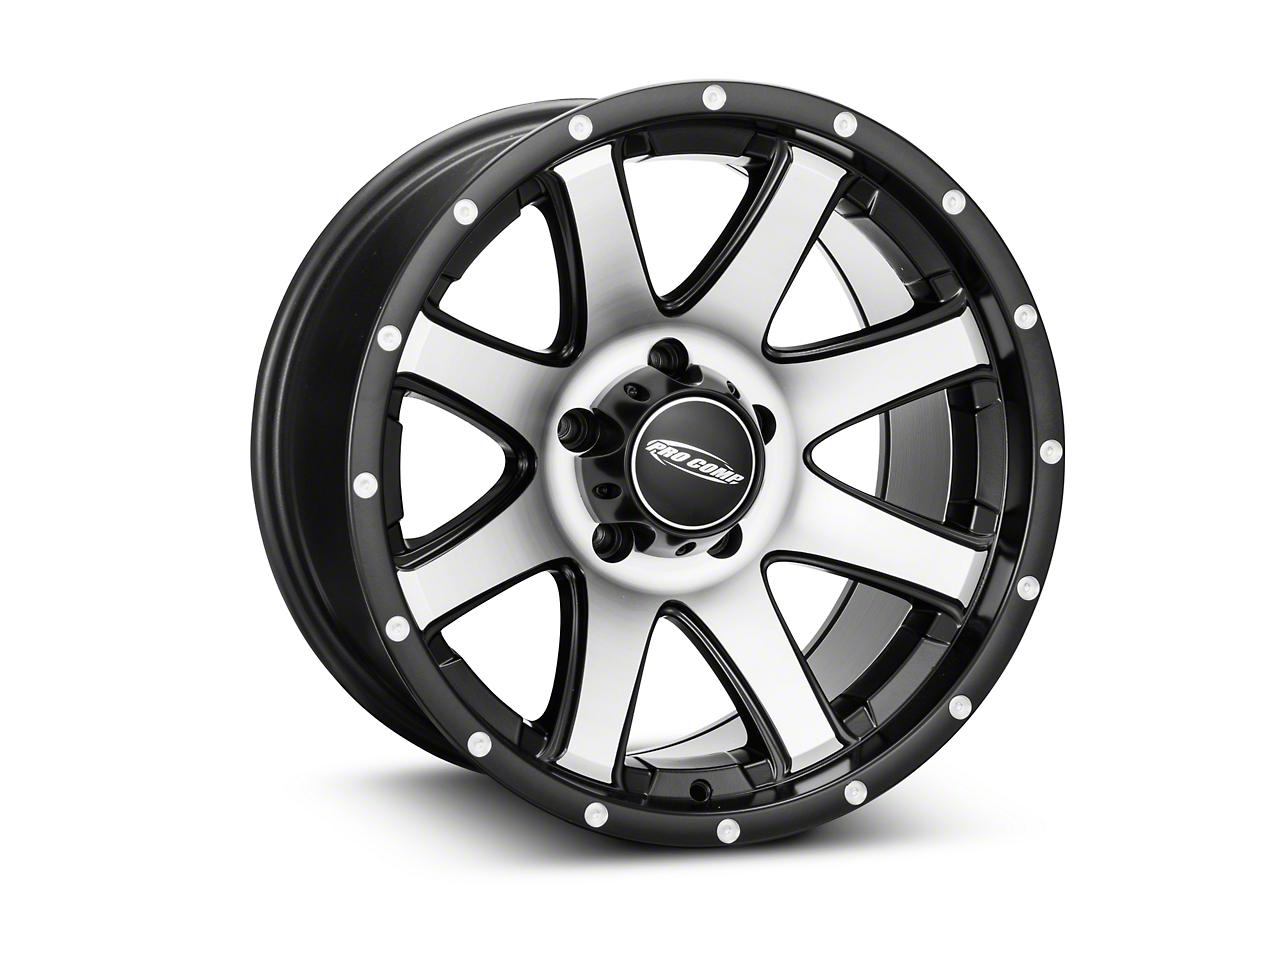 Pro Comp Alloy Series 86 Reflex Black Machined Wheel - 17x9 (07-18 Wrangler JK)